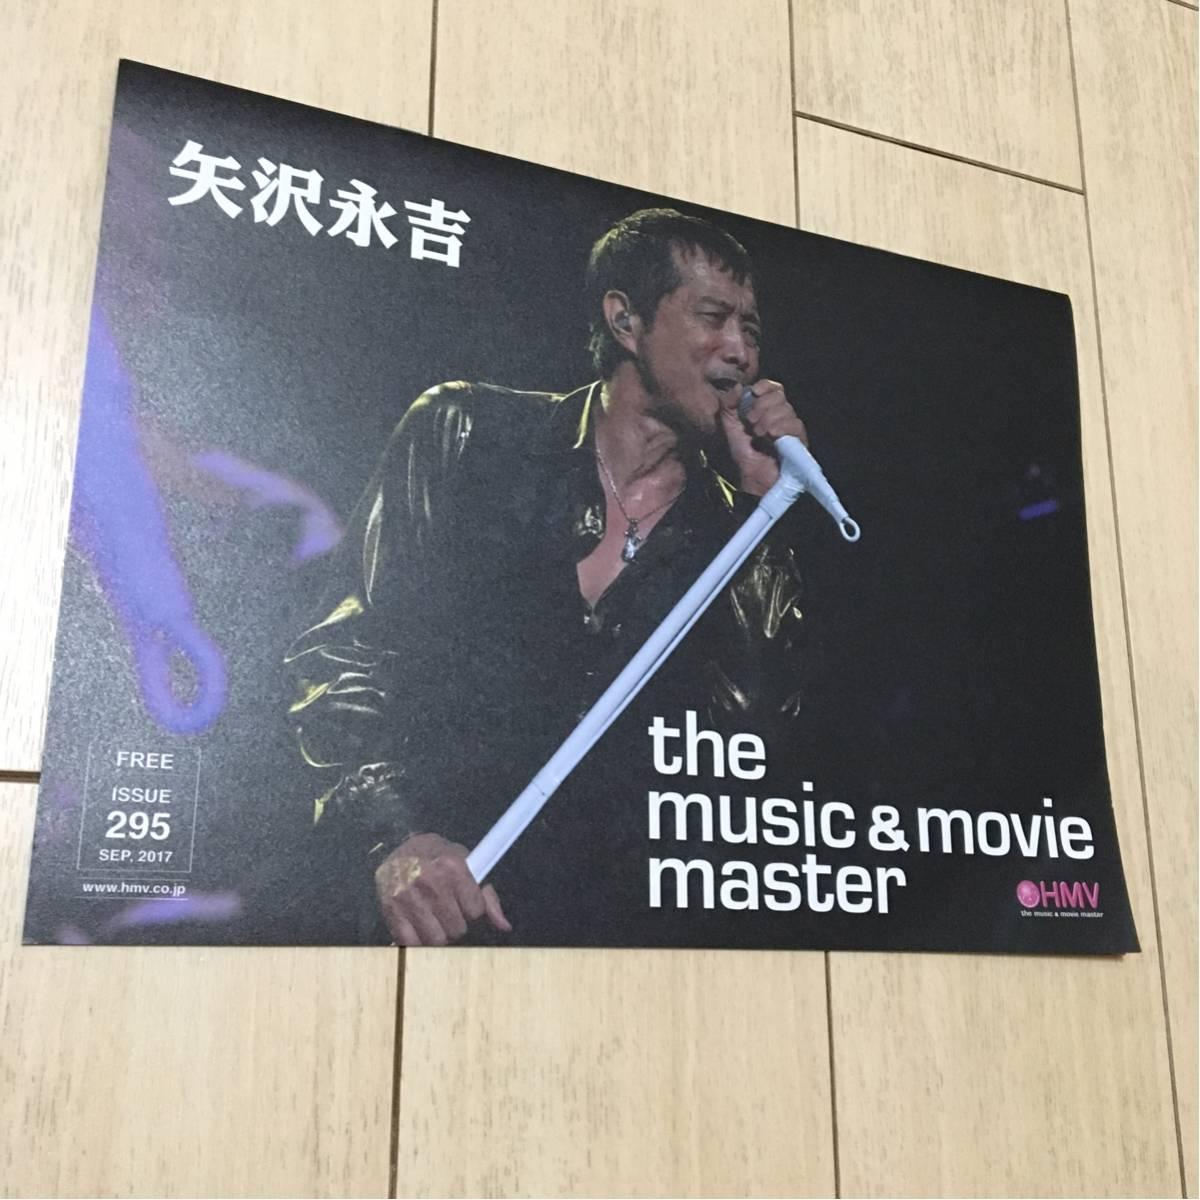 hmv フリーペーパー 表紙 矢沢永吉 fifth harmony 2017 チラシ マンスリー